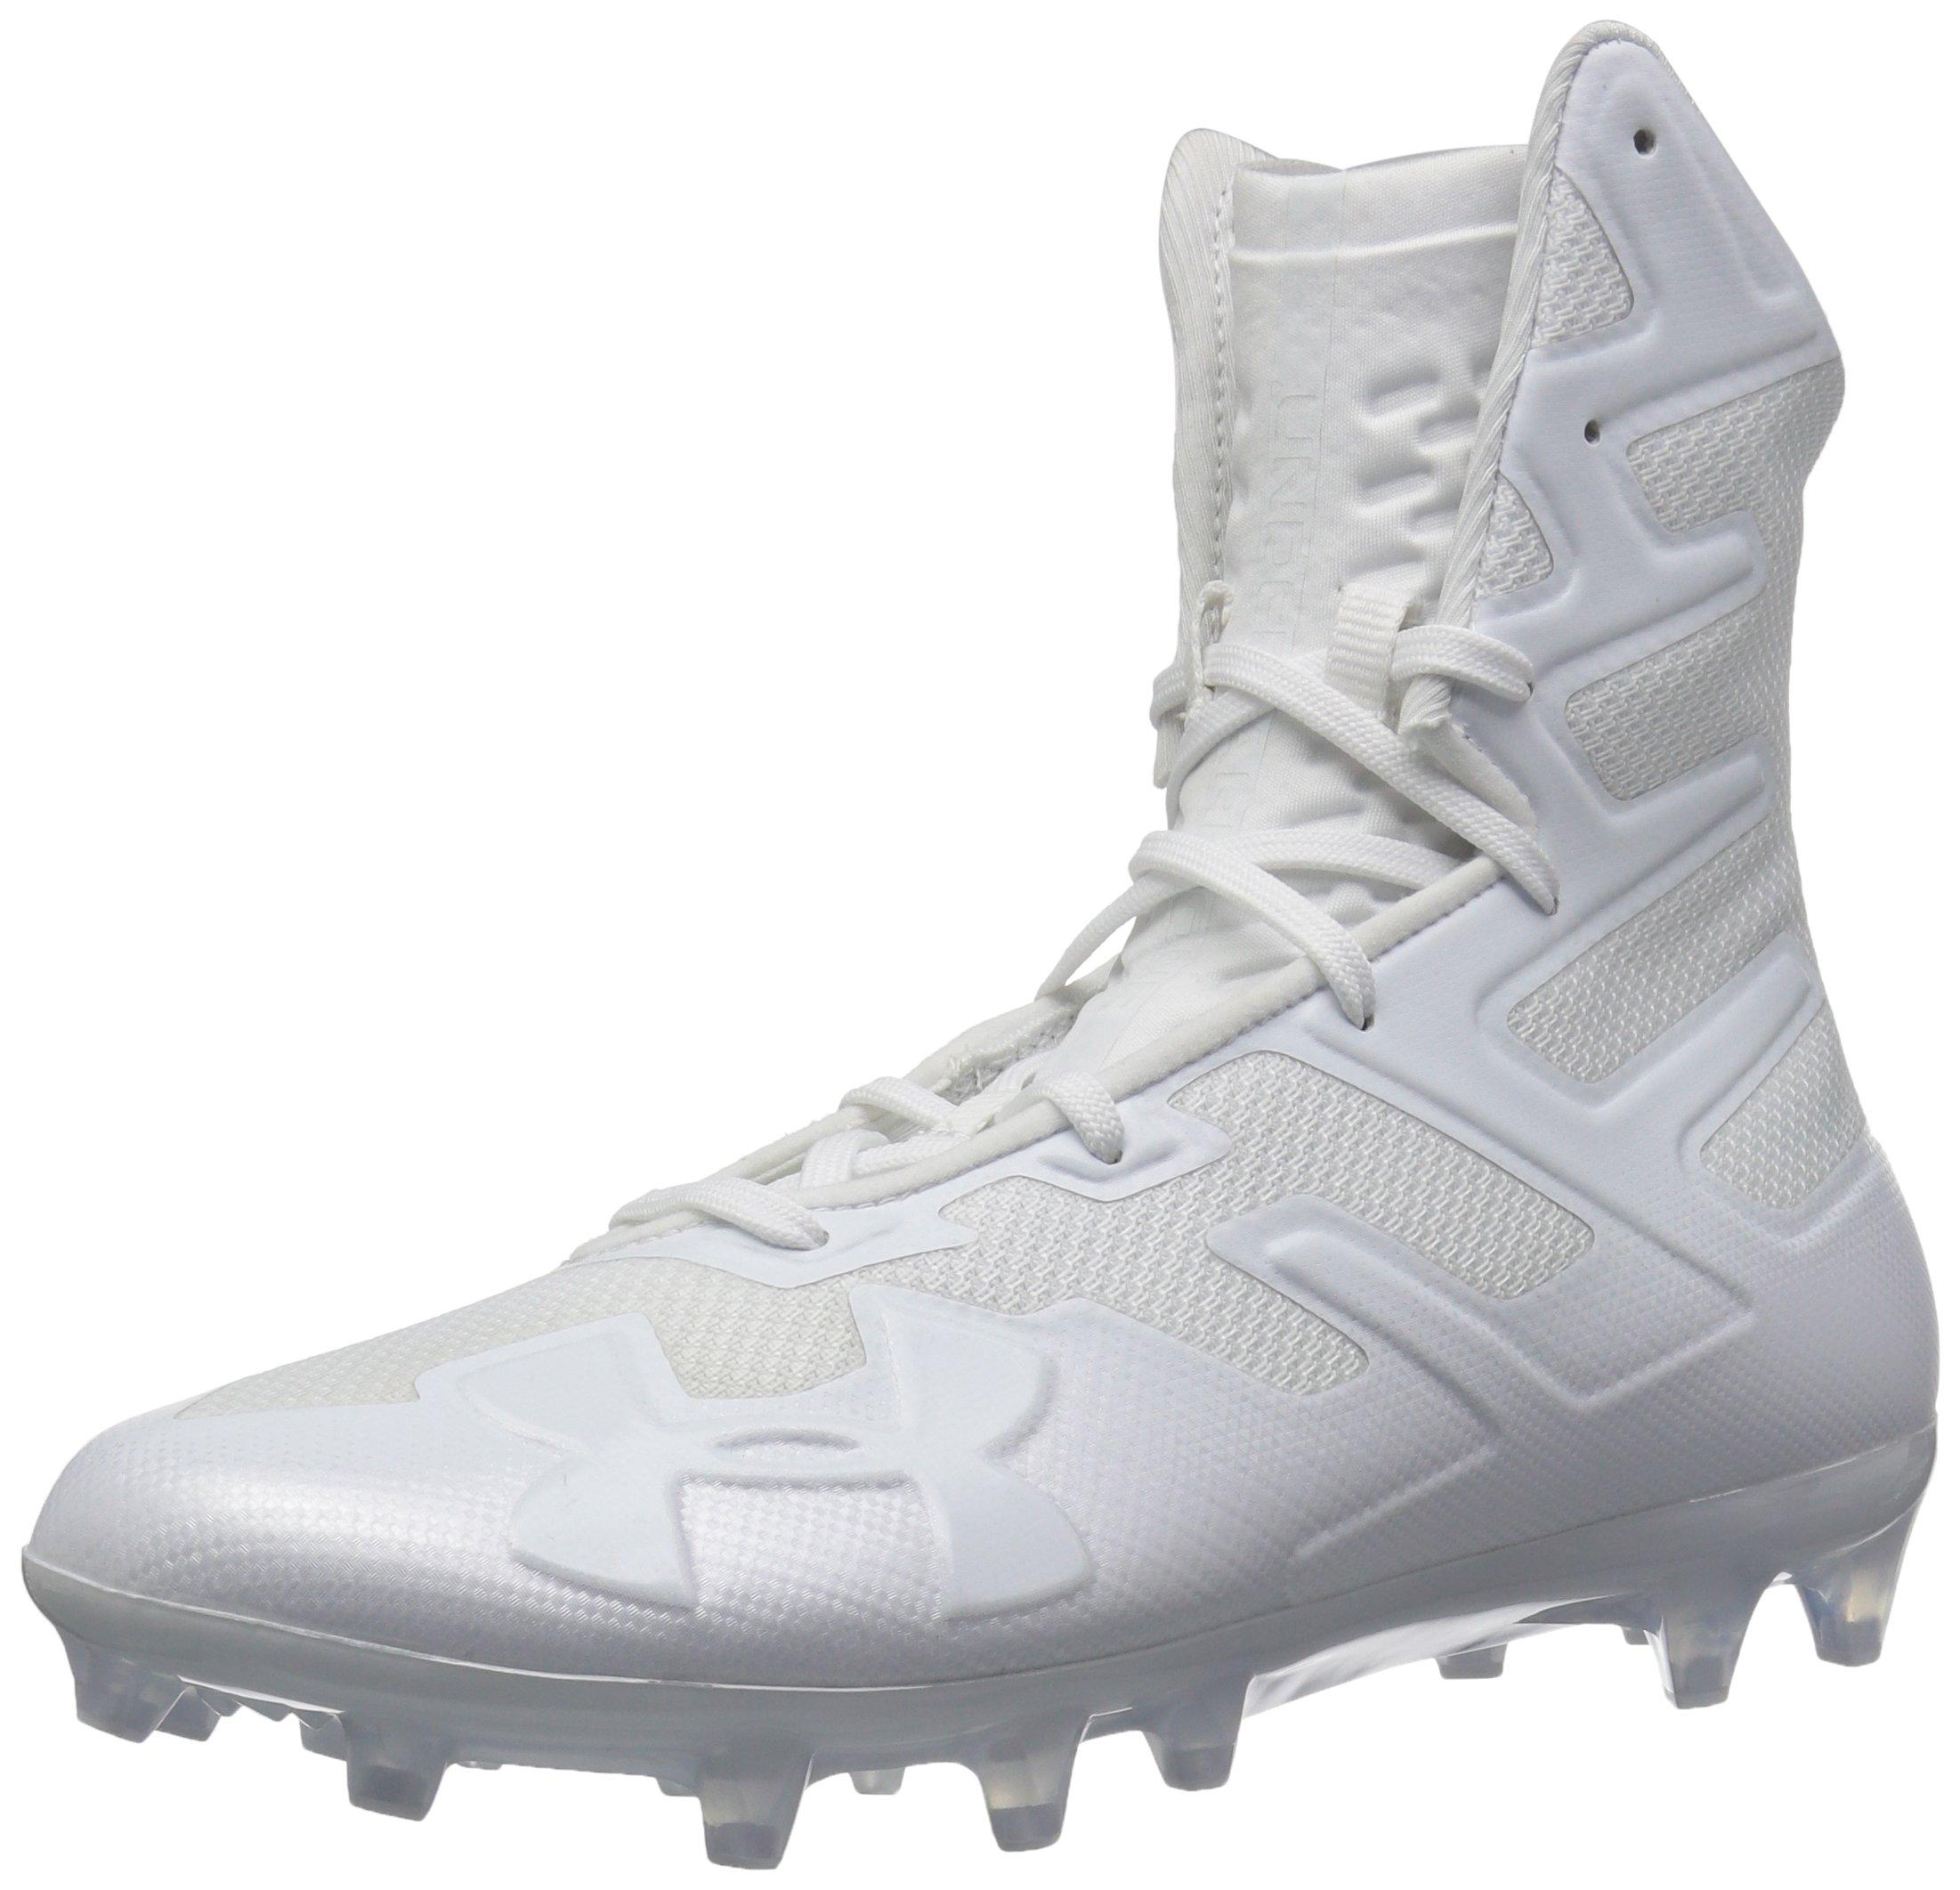 13 3000177 002 /White Black Under Armour Mens Highlight MC Football Shoe